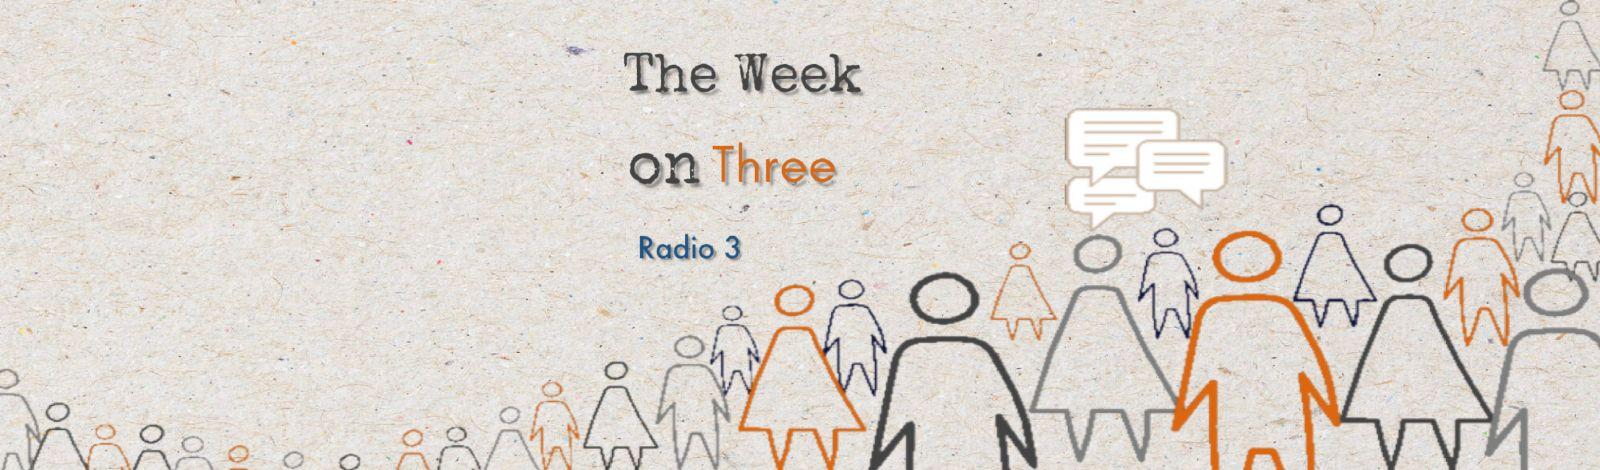 The Week On Three